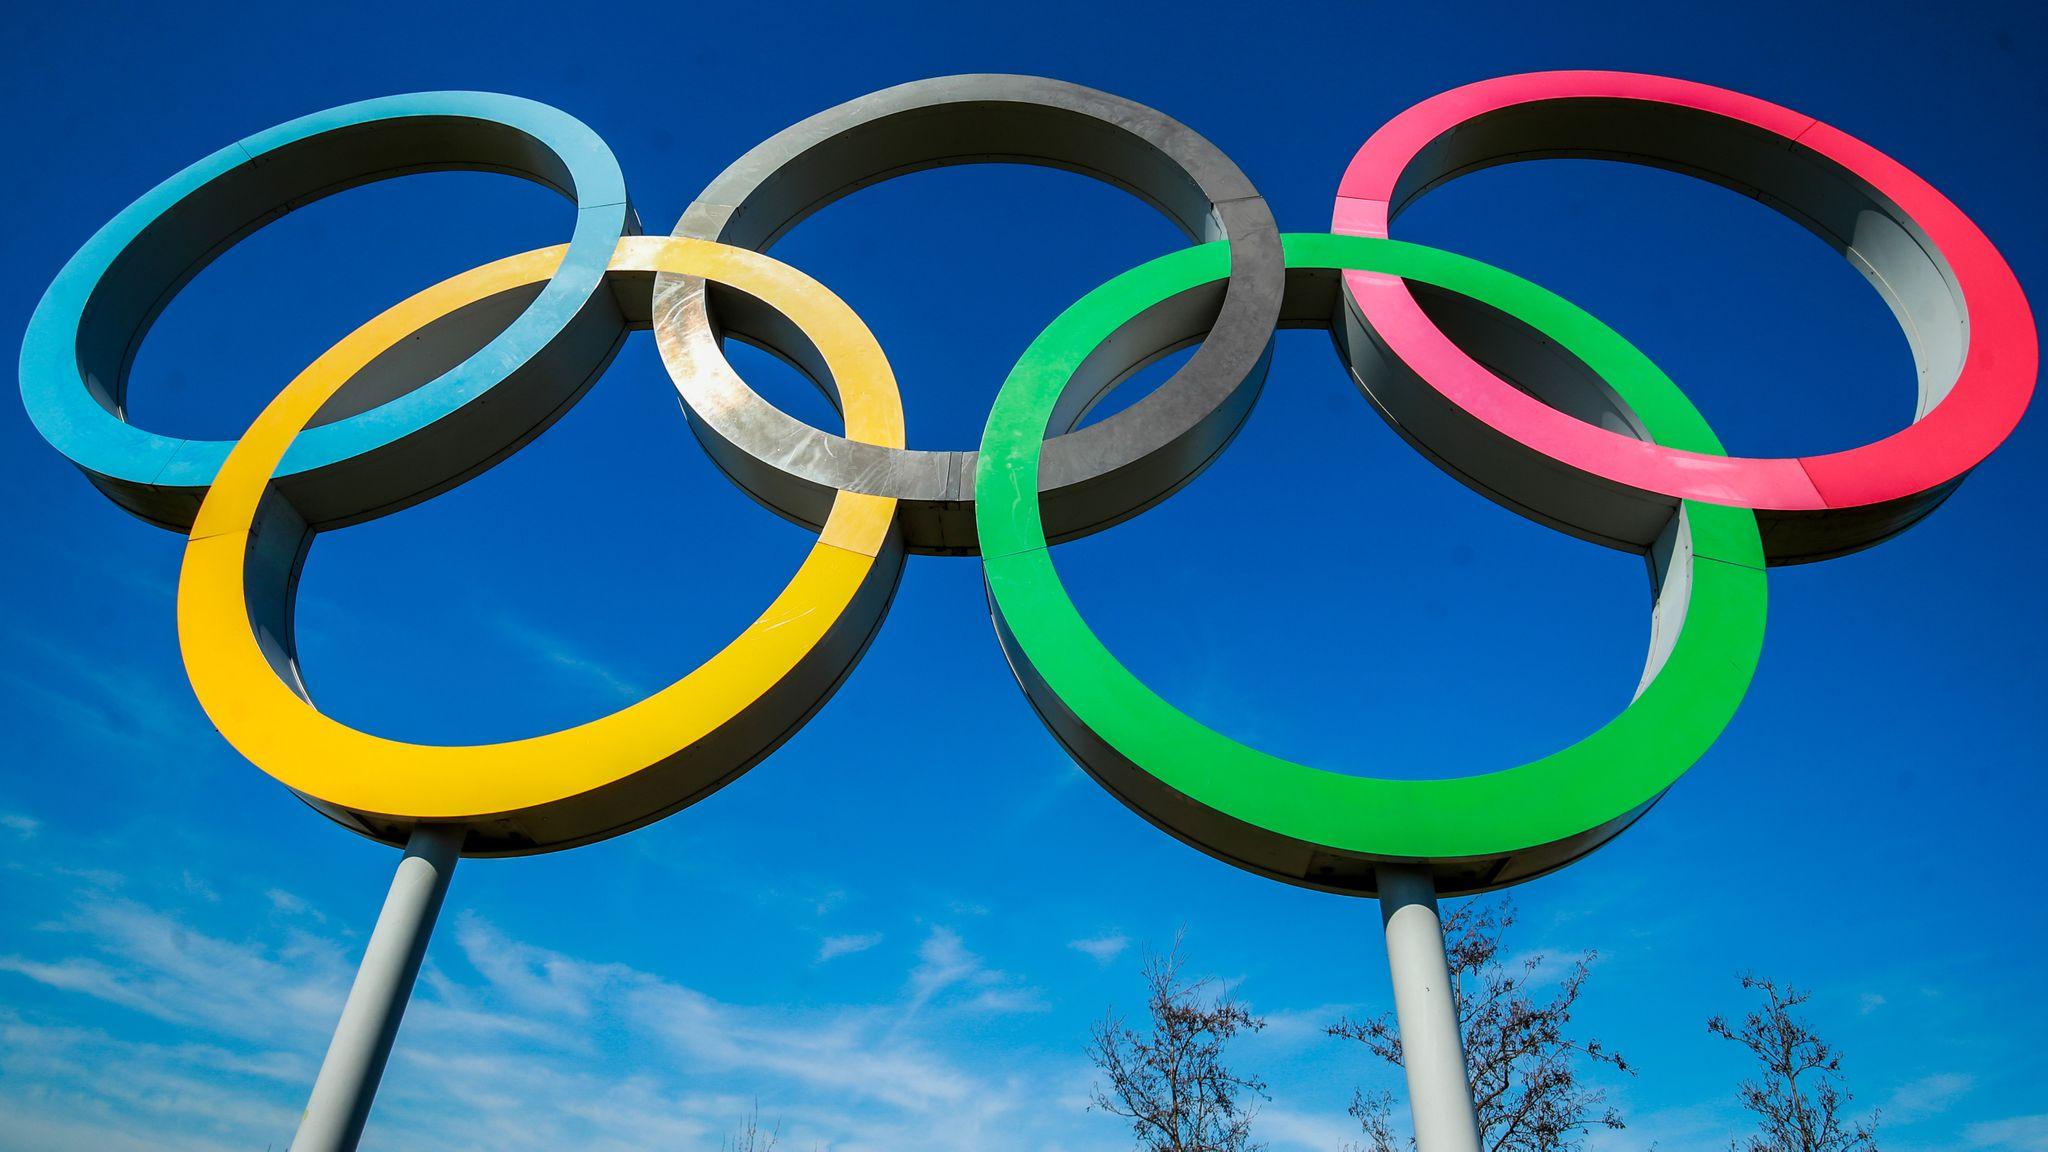 Olimpiyat tarihi